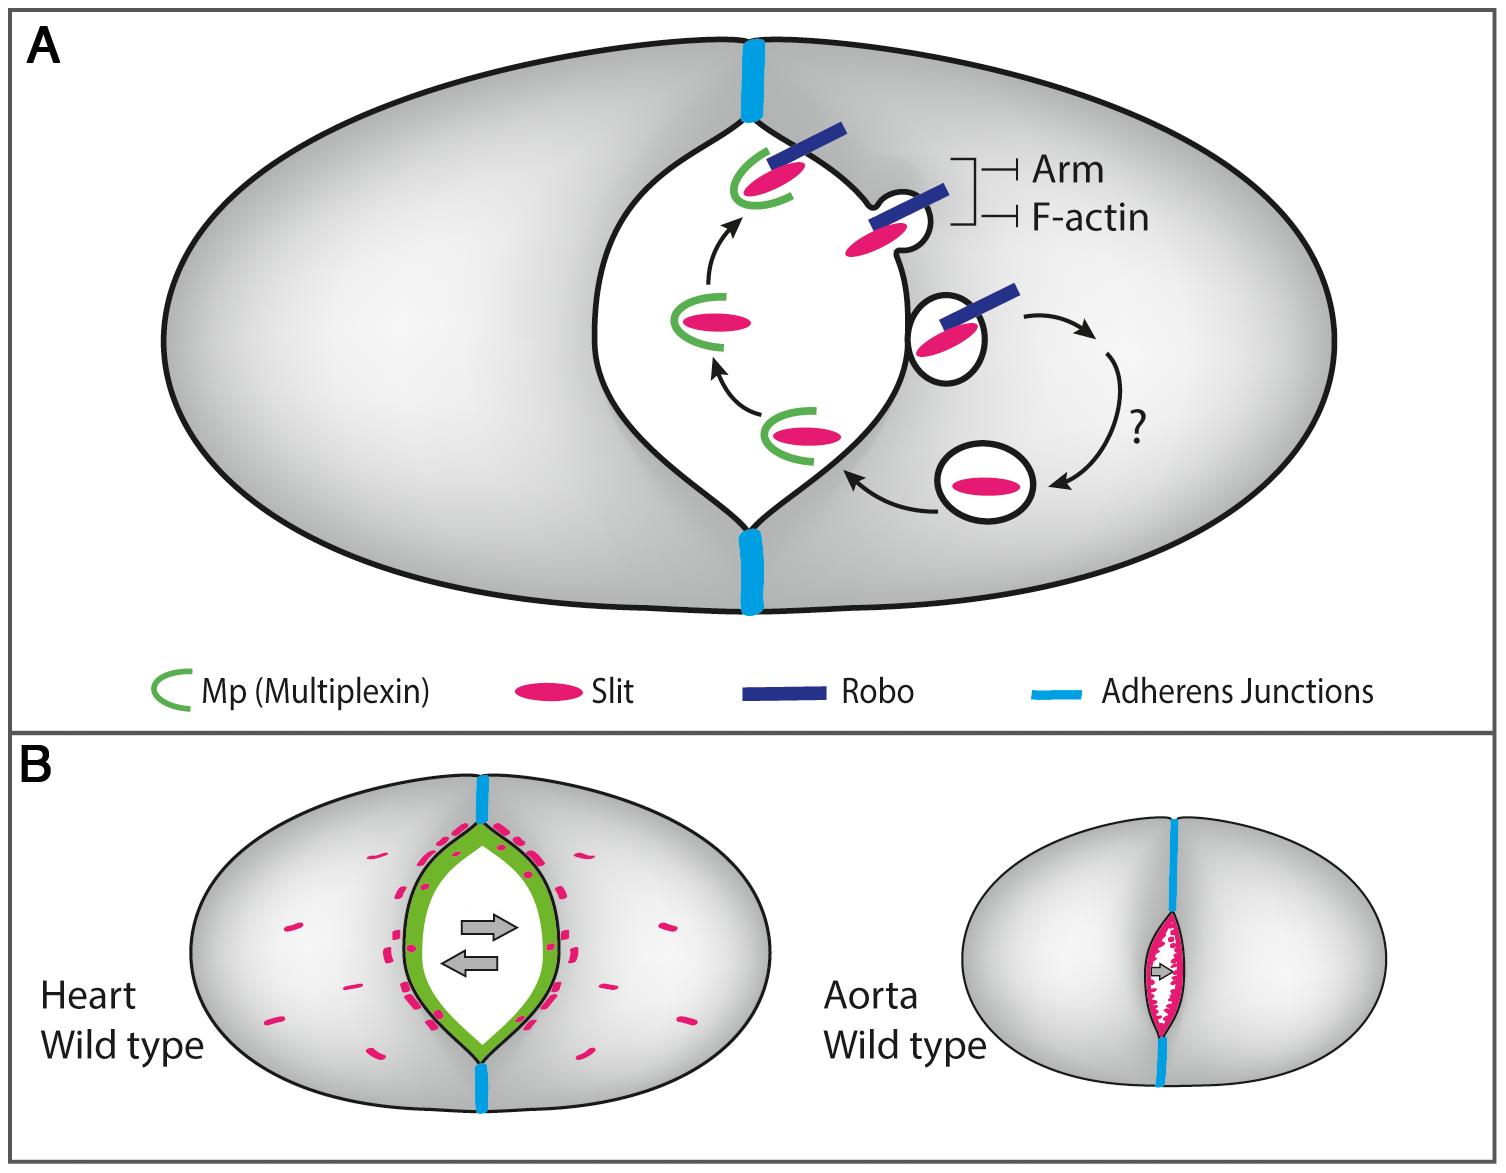 A scheme describing the molecular interactions between Mp, Slit/Robo and F-actin in the heart and the aorta.